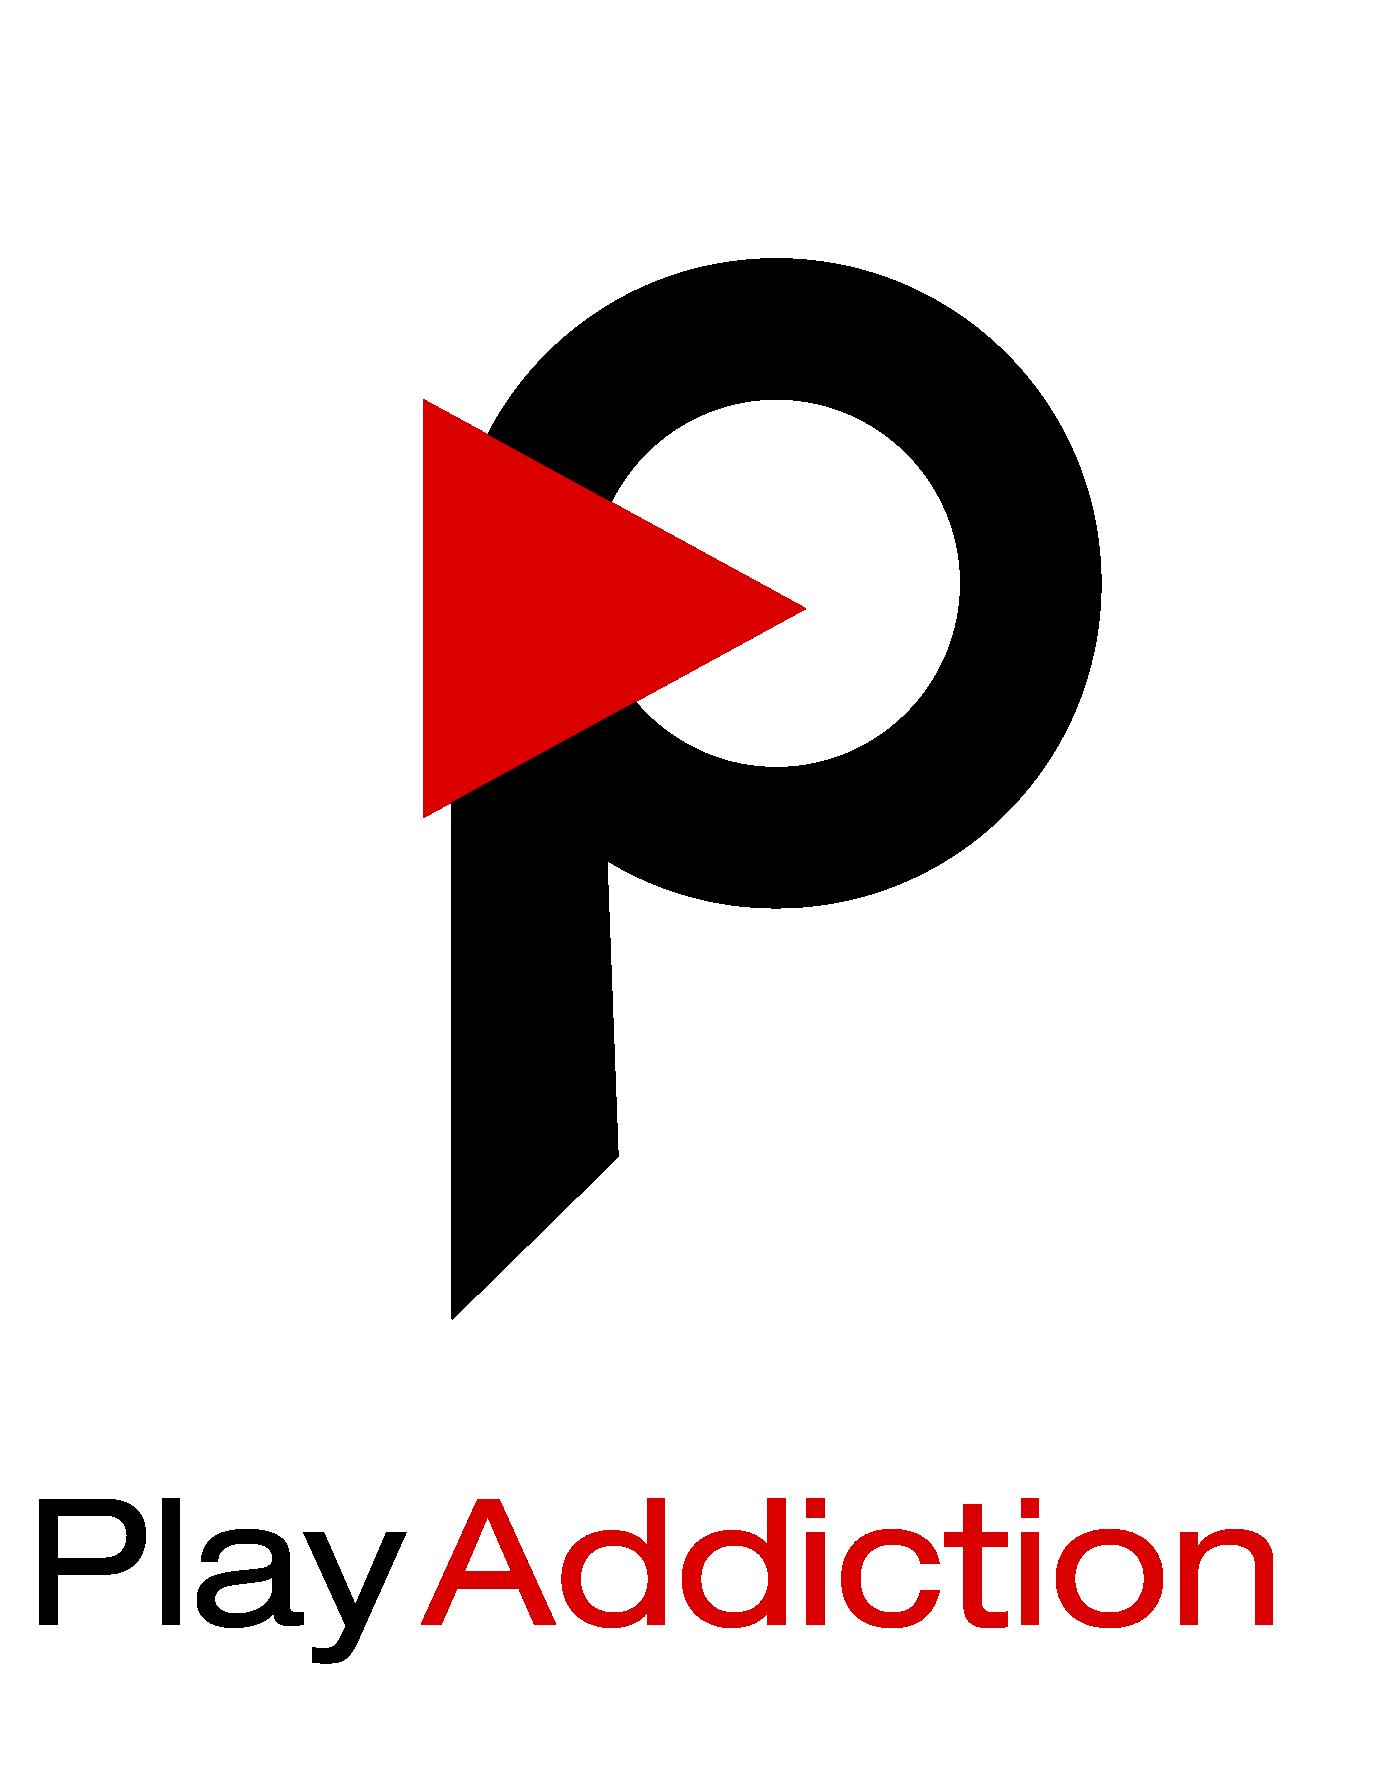 Play Addiction